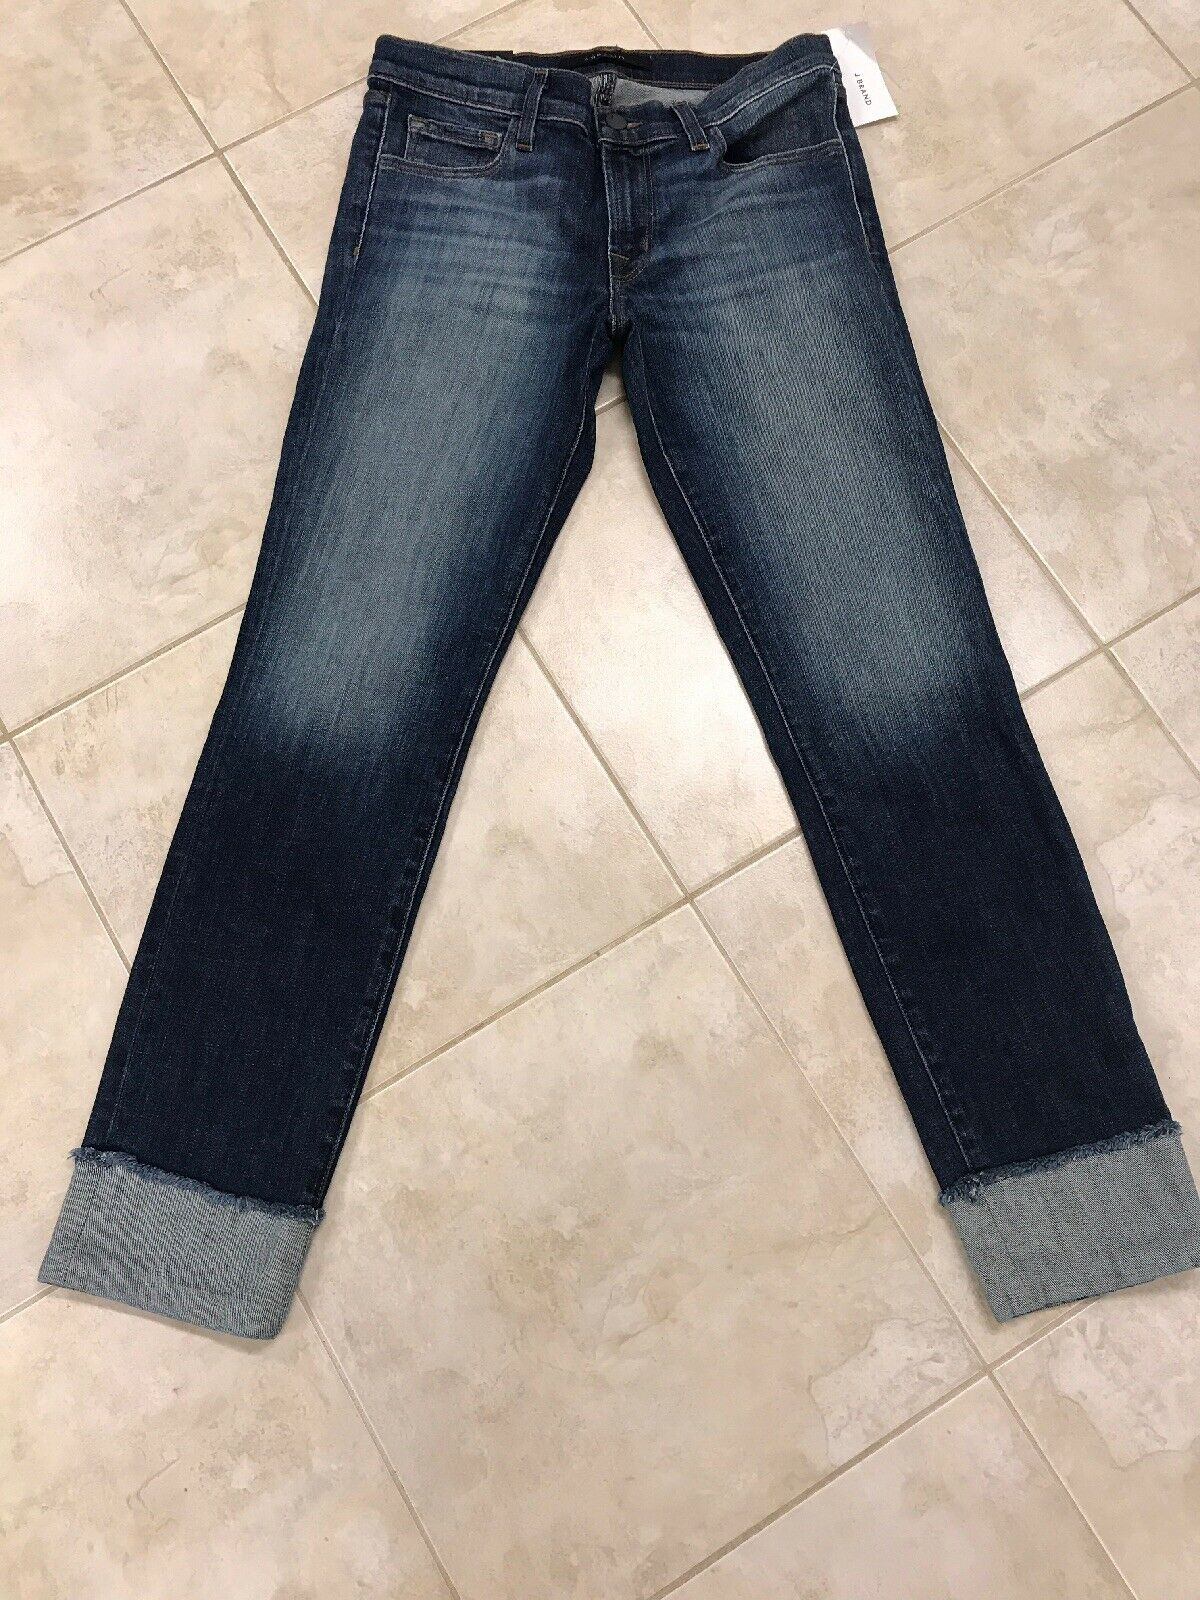 New J Brand Jasper Hipster Low Rise Jasper Jeans Size 27